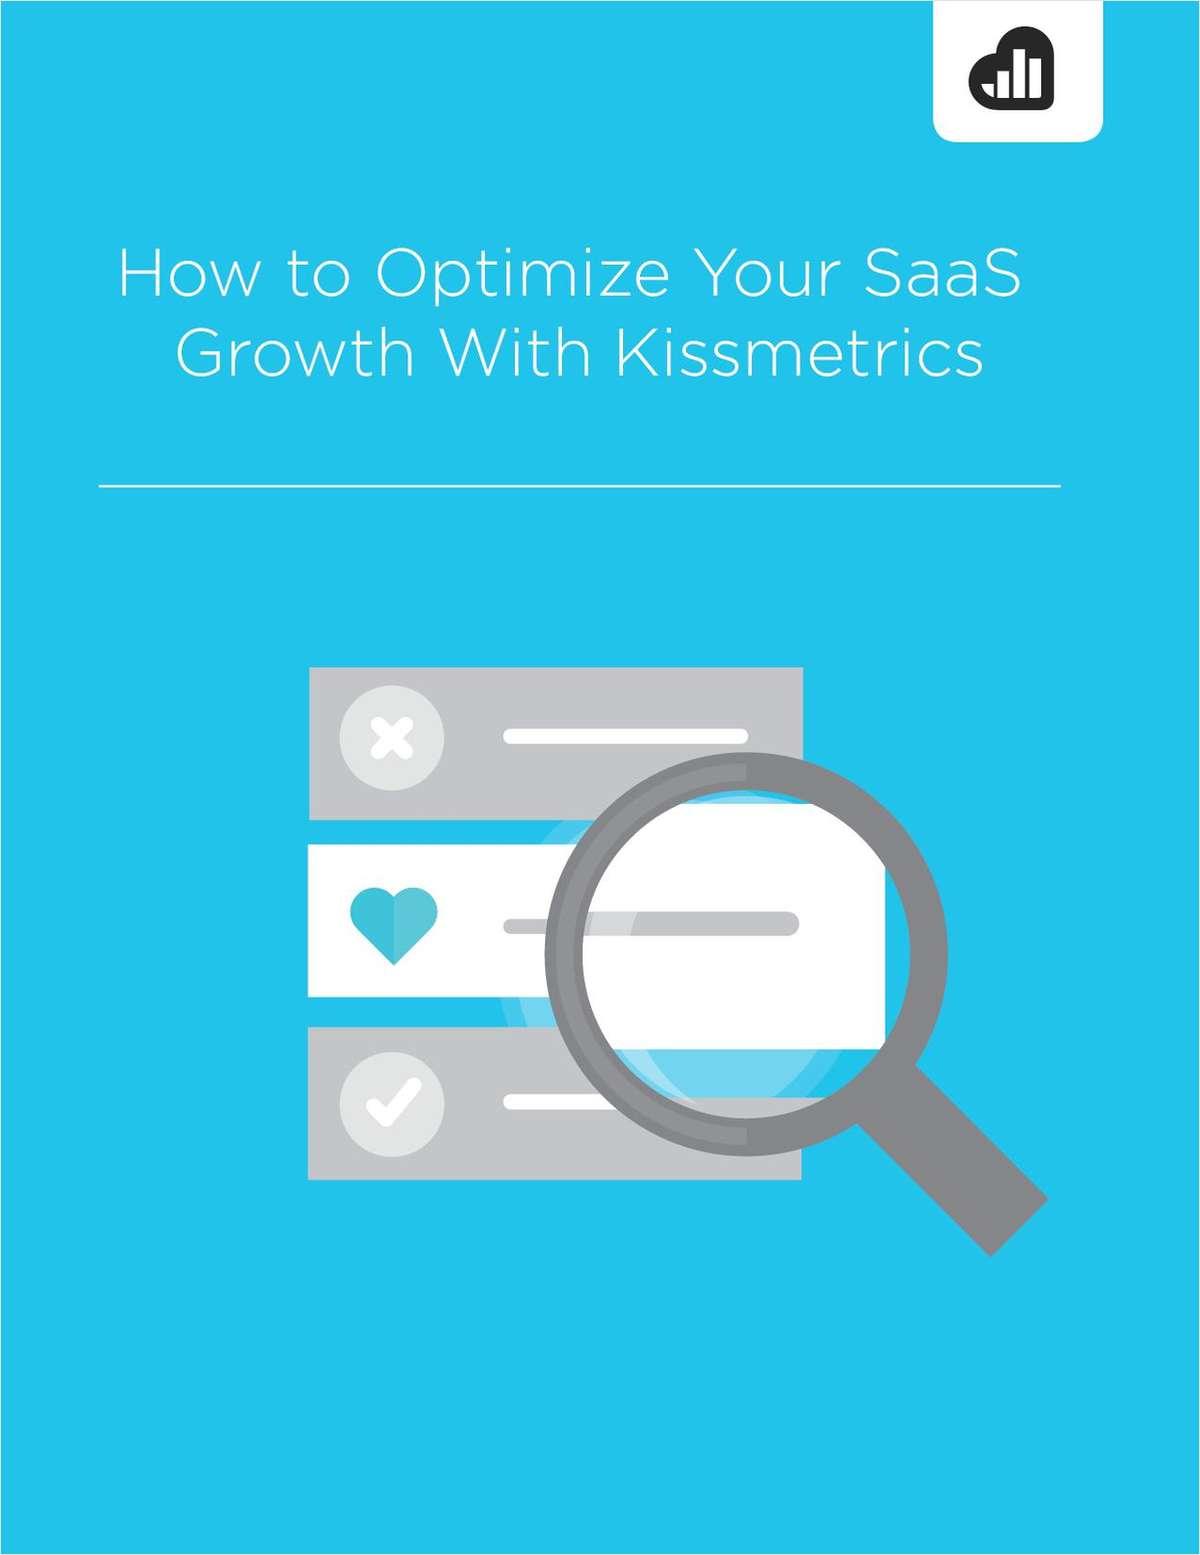 How to Optimize Your SaaS Growth With Kissmetrics